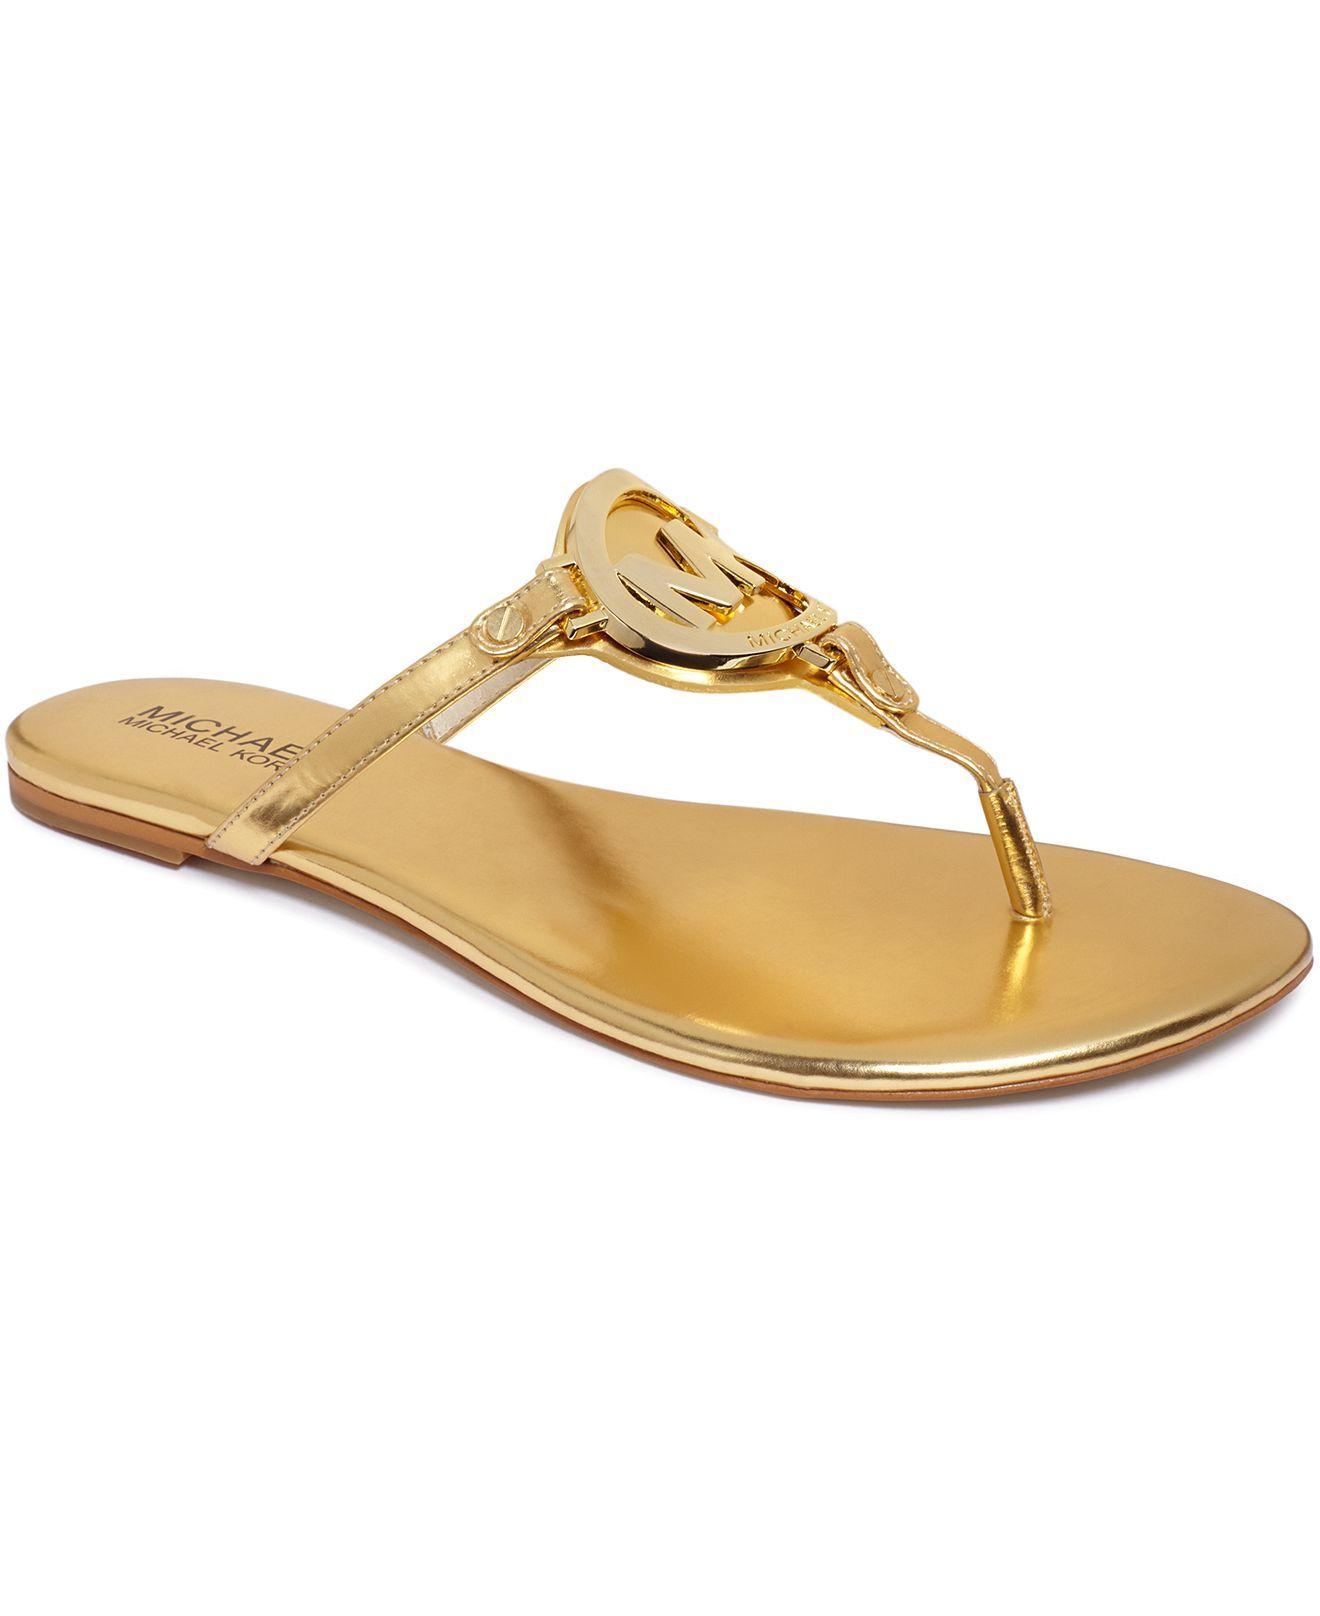 dfd88f3bb6d5 MICHAEL Michael Kors Shoes